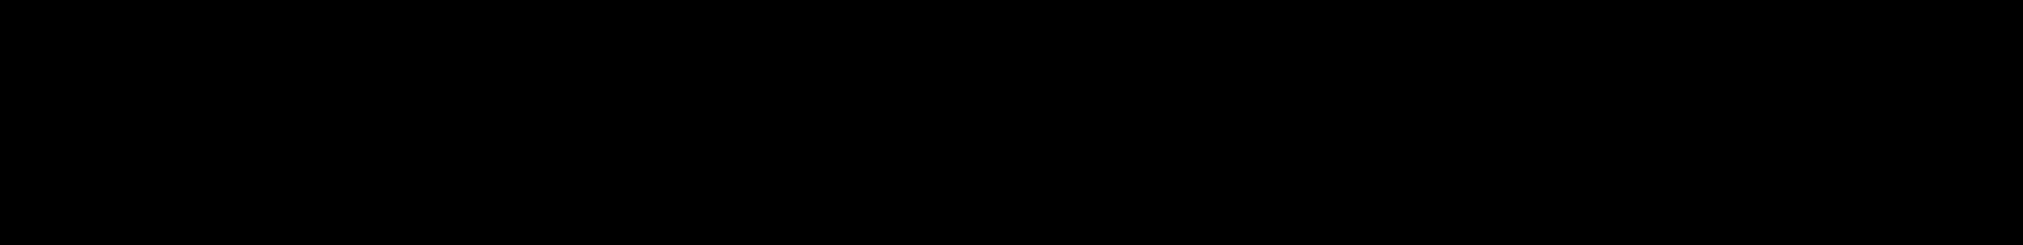 Illustrated Glossary Of Organic Chemistry Fatty Acid